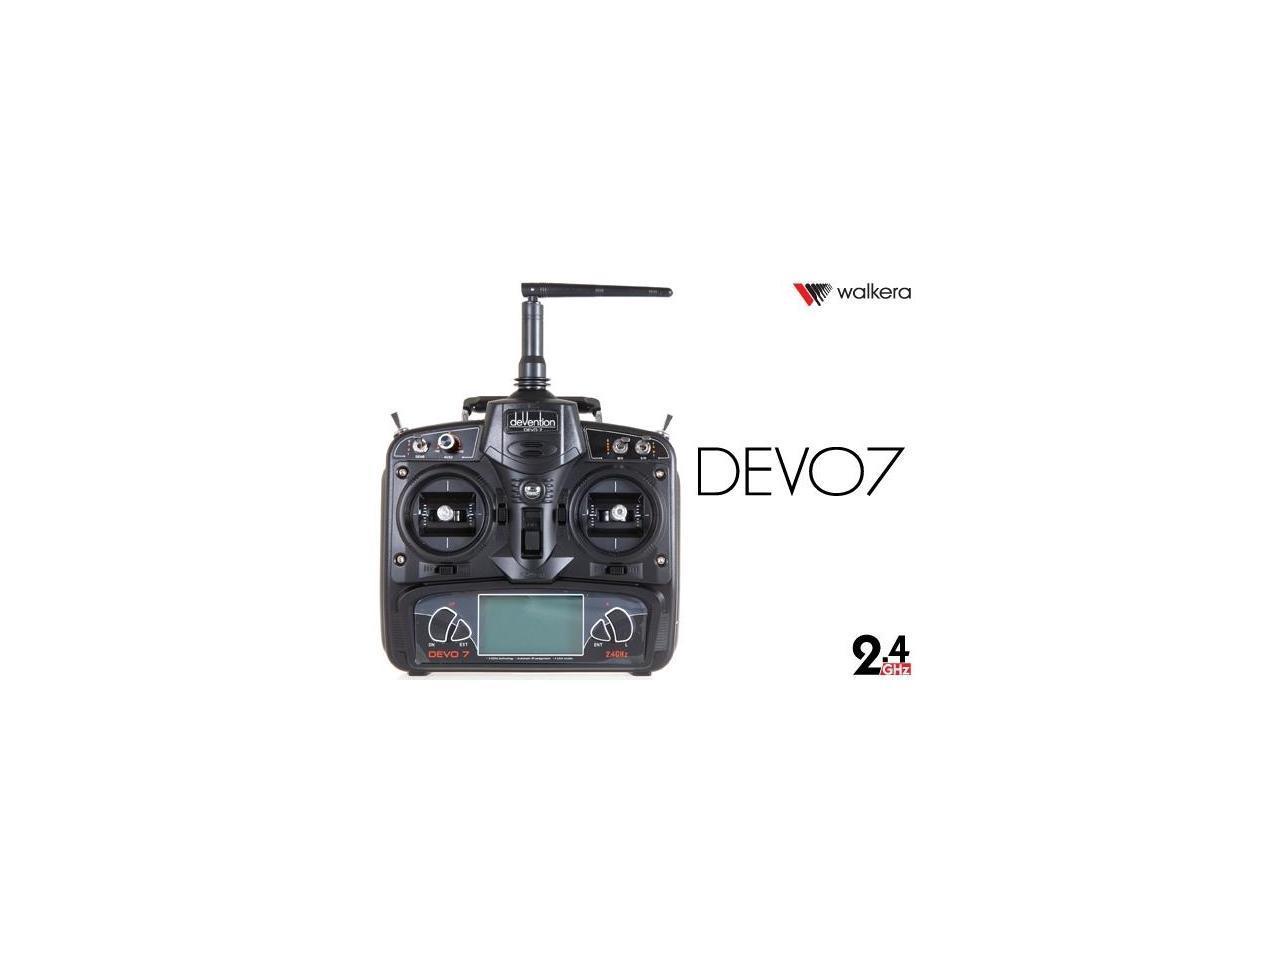 Walkera Devo 7 Transmitter Controller Remote Control Newegg Com